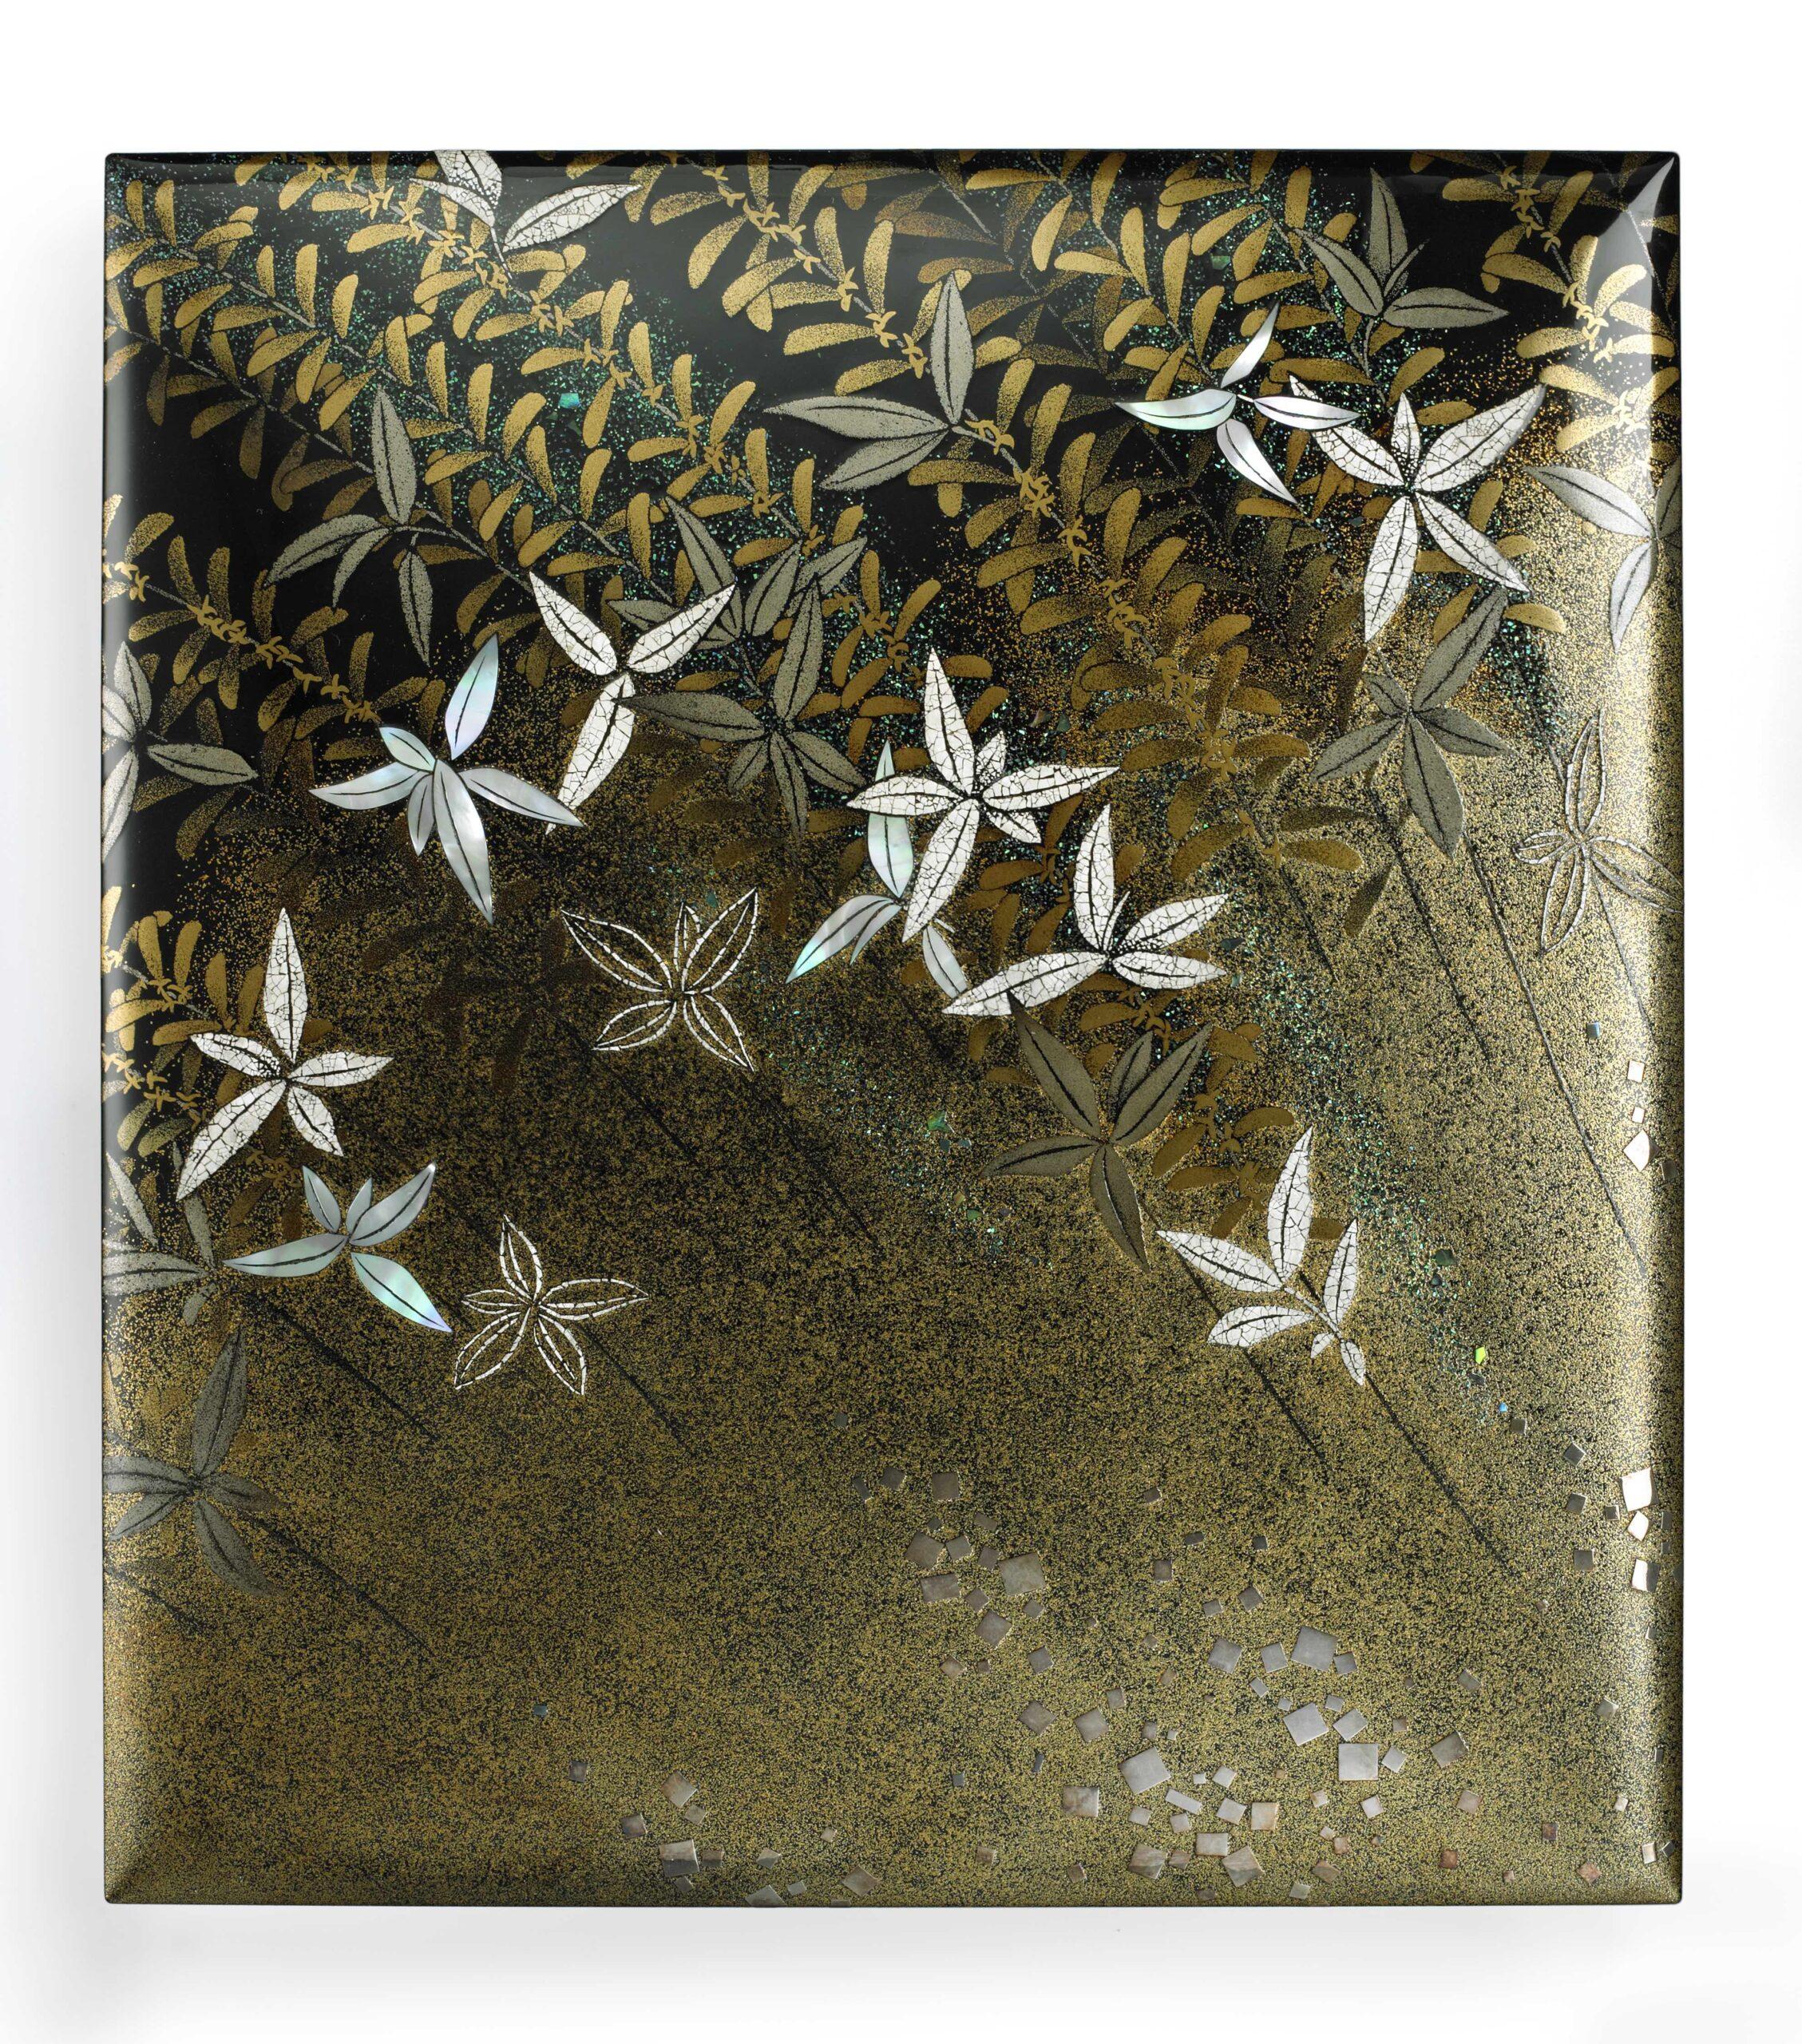 EARLY SPRING WILLOW soshun no yanagi by KATAYAMA Masahiko (b. 1957)   Heisei period, 1980s Lacquer – makie, with shell and metal inlays